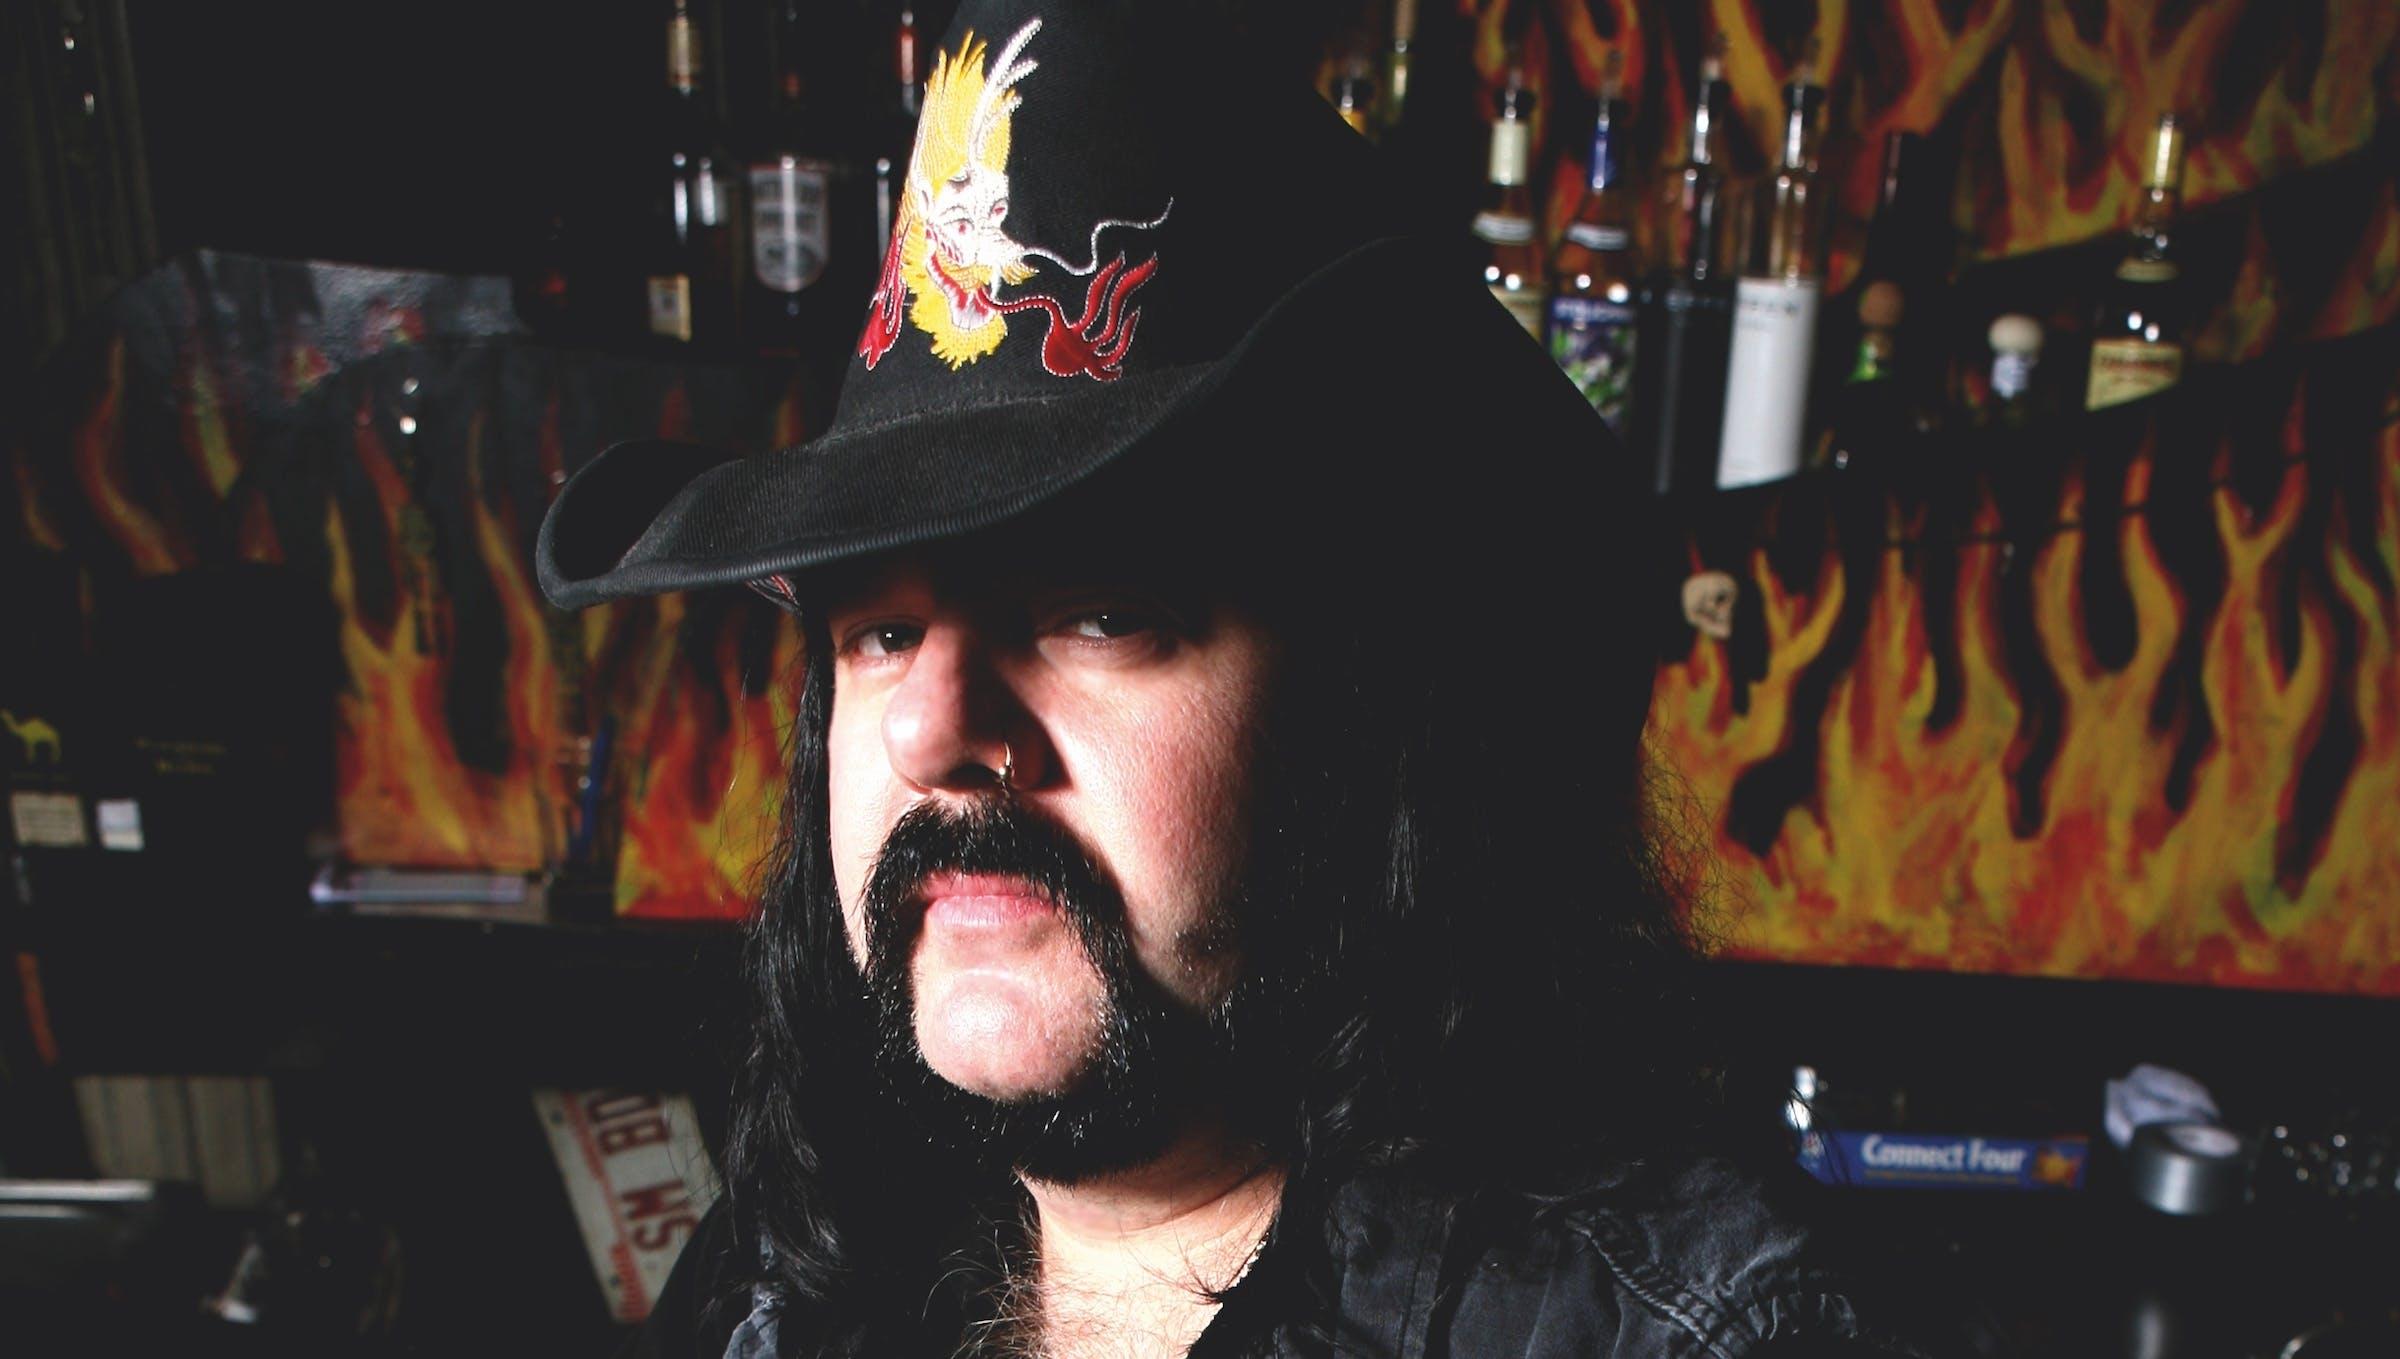 Hellyeah Announce New Album Featuring Vinnie Paul's Final Recordings